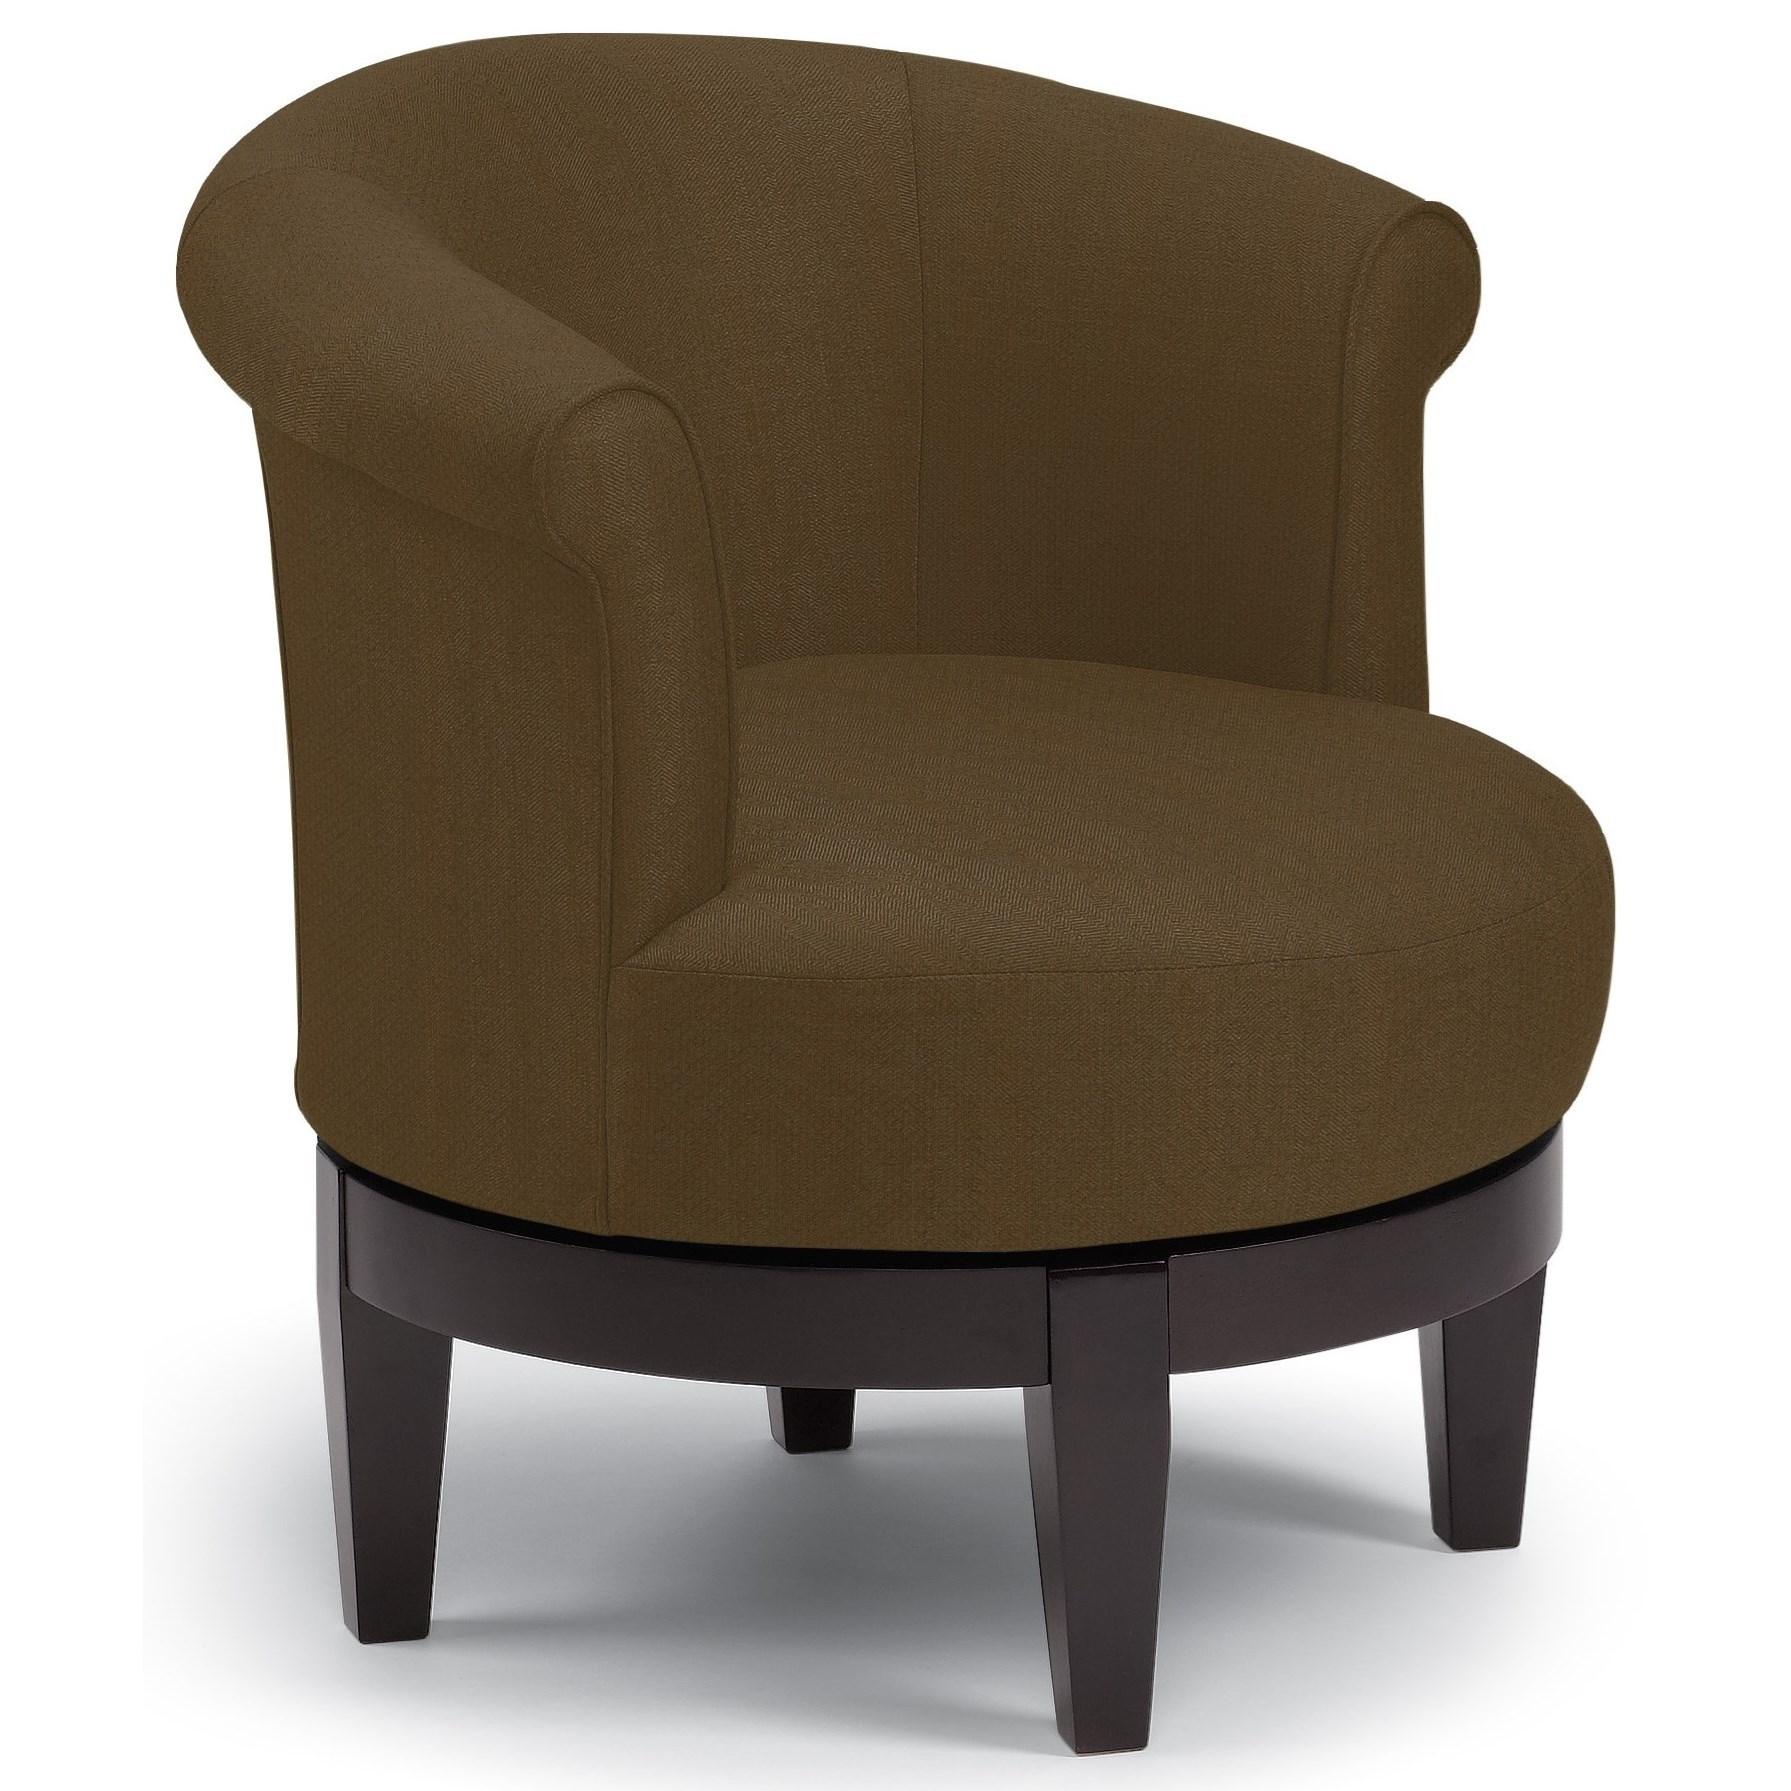 Chairs - Swivel Barrel Attica Swivel Chair by Best Home Furnishings at Lucas Furniture & Mattress